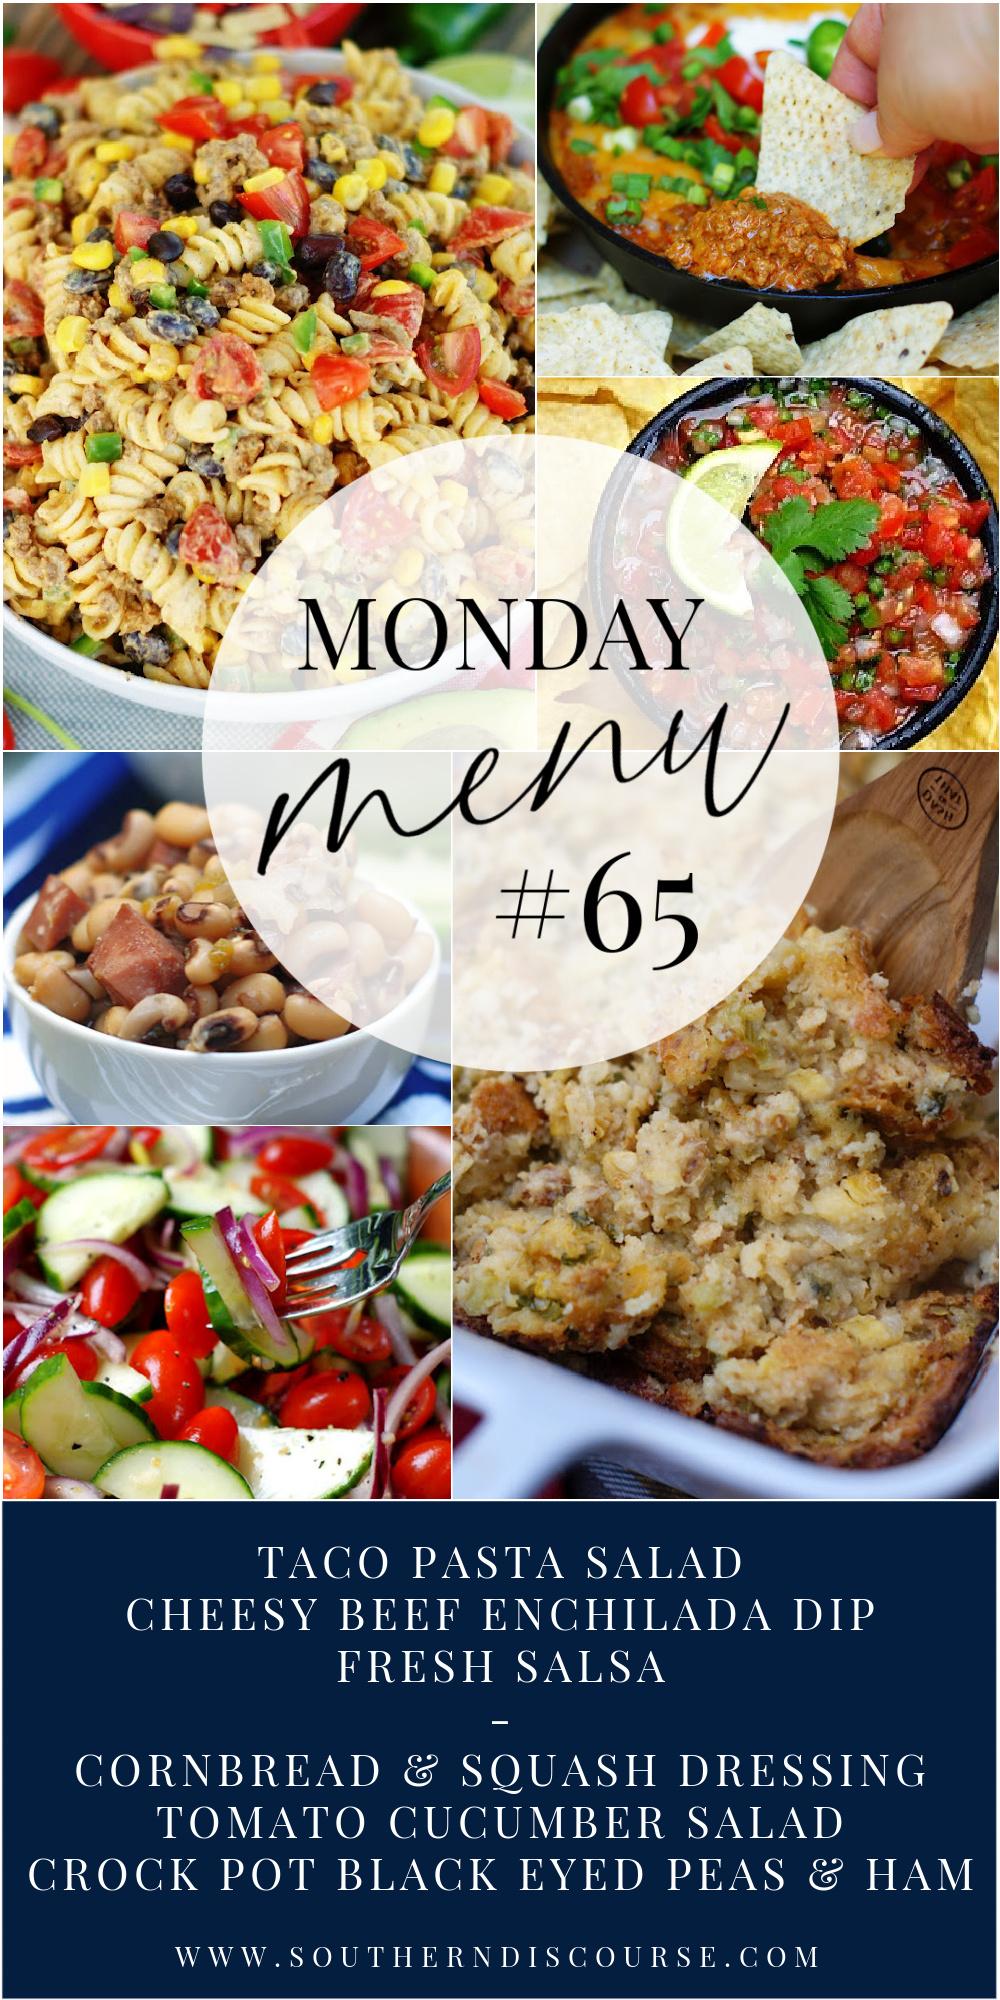 Monday Menu #65